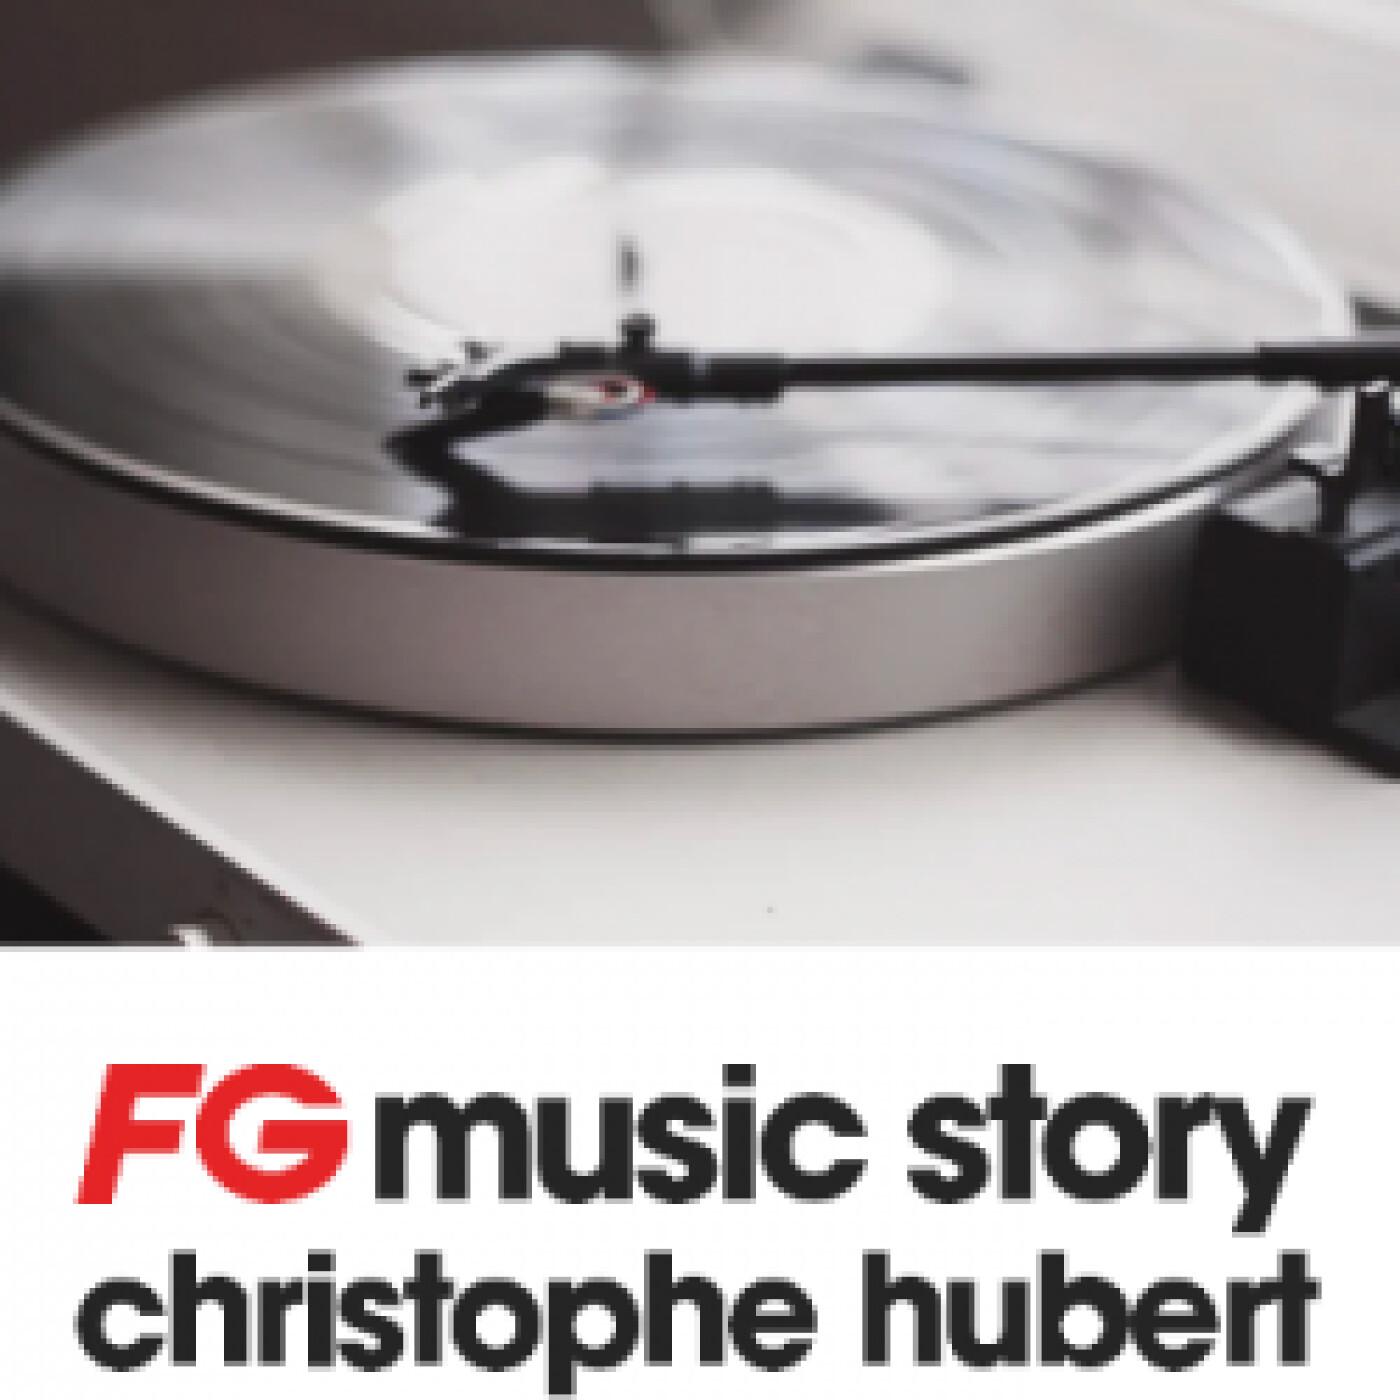 FG MUSIC STORY : SILK CITY